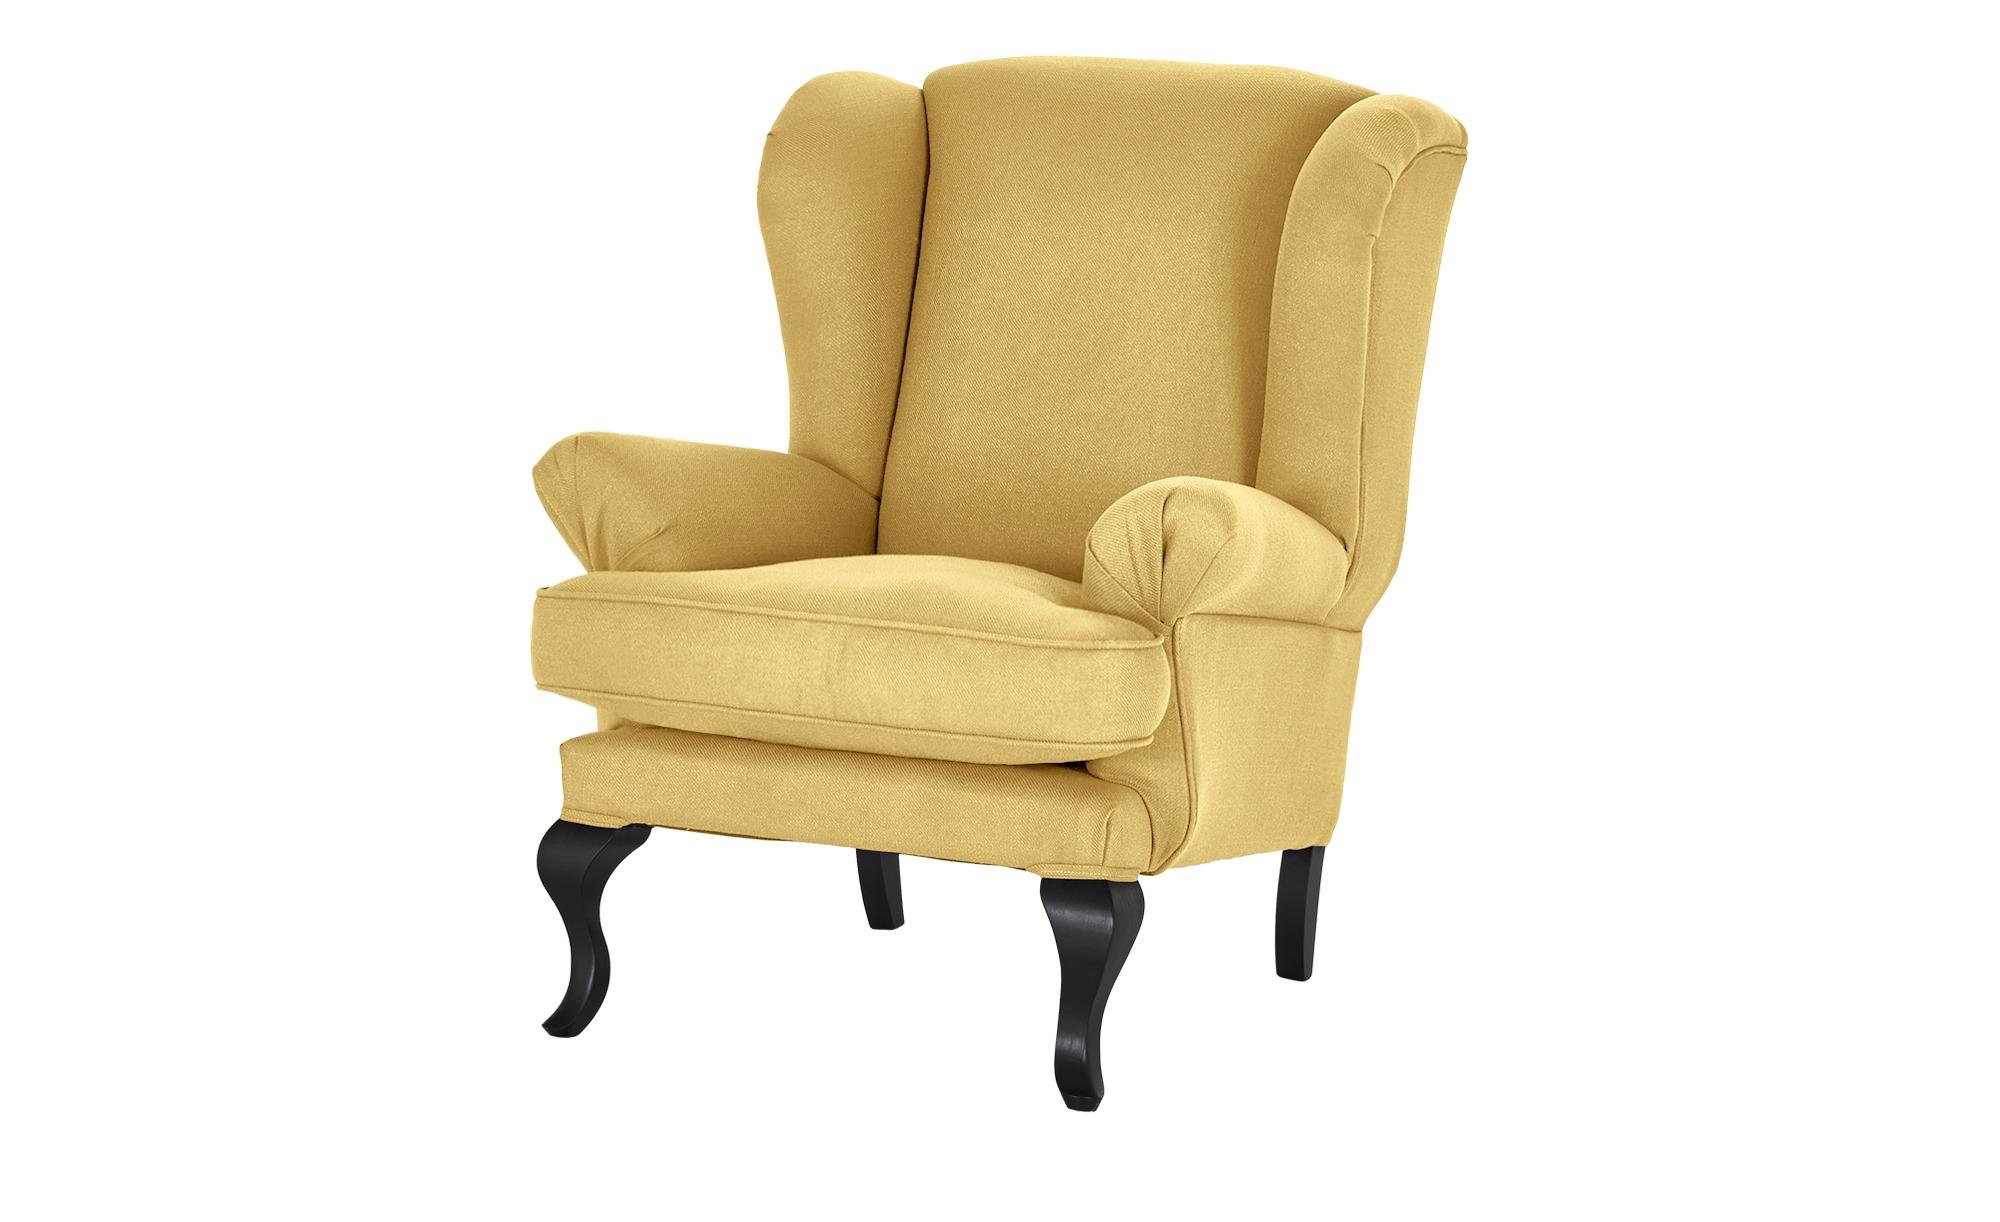 smart Ohrensessel  Charmaine ¦ gelb ¦ Maße (cm): B: 84 H: 98 T: 85 Polstermöbel > Sessel > Ohrensessel - Höffner